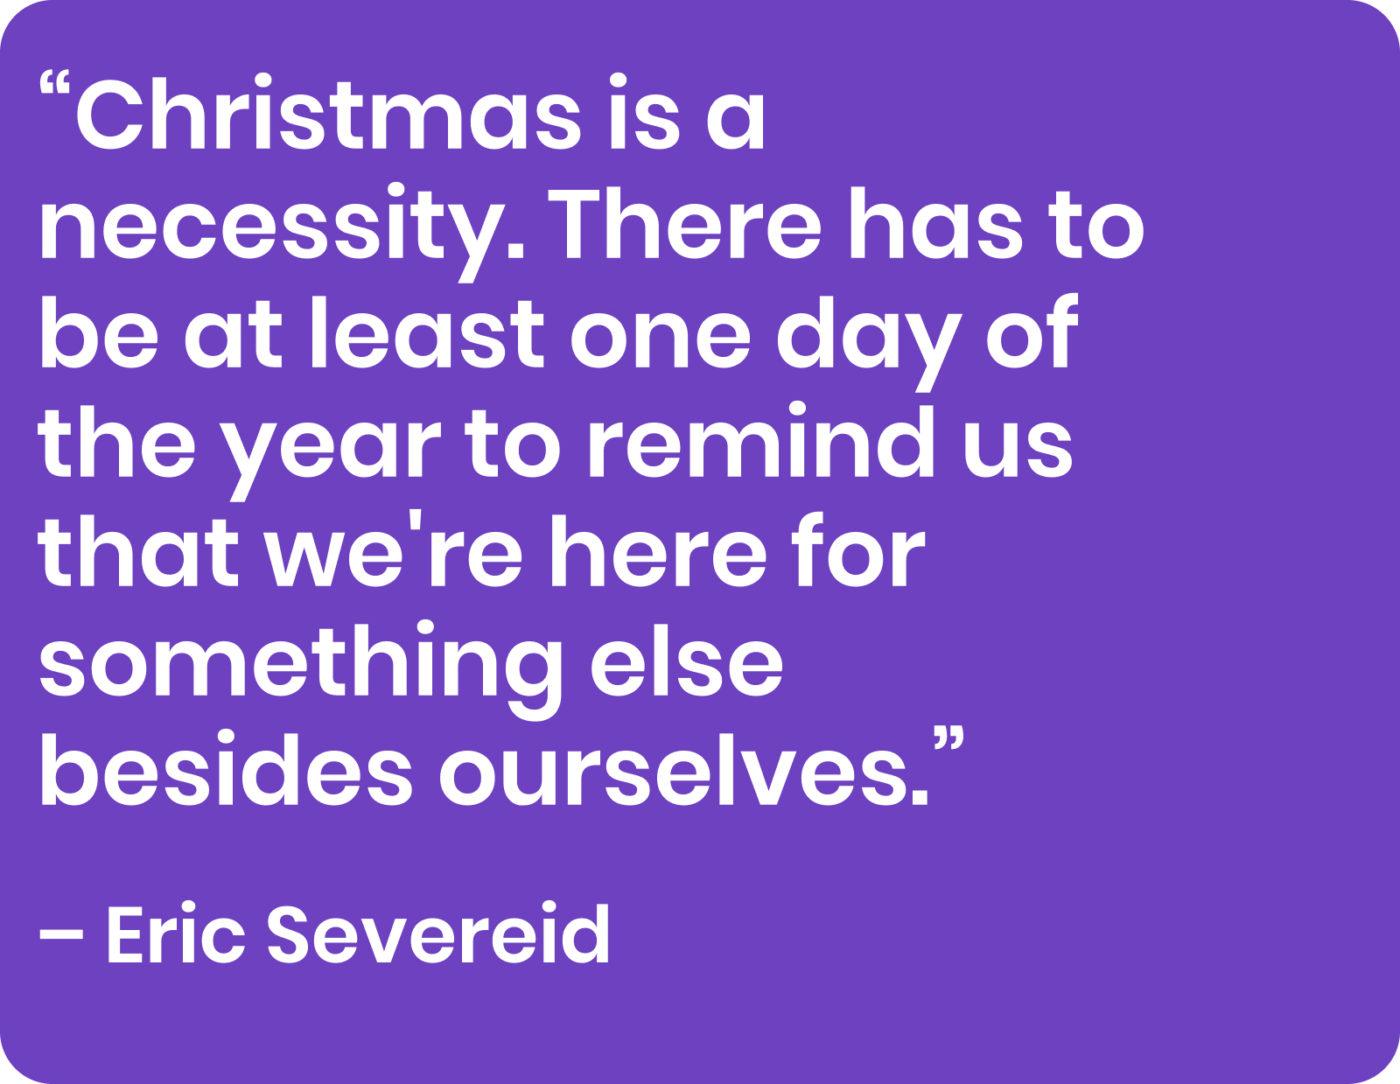 Eric Severeid